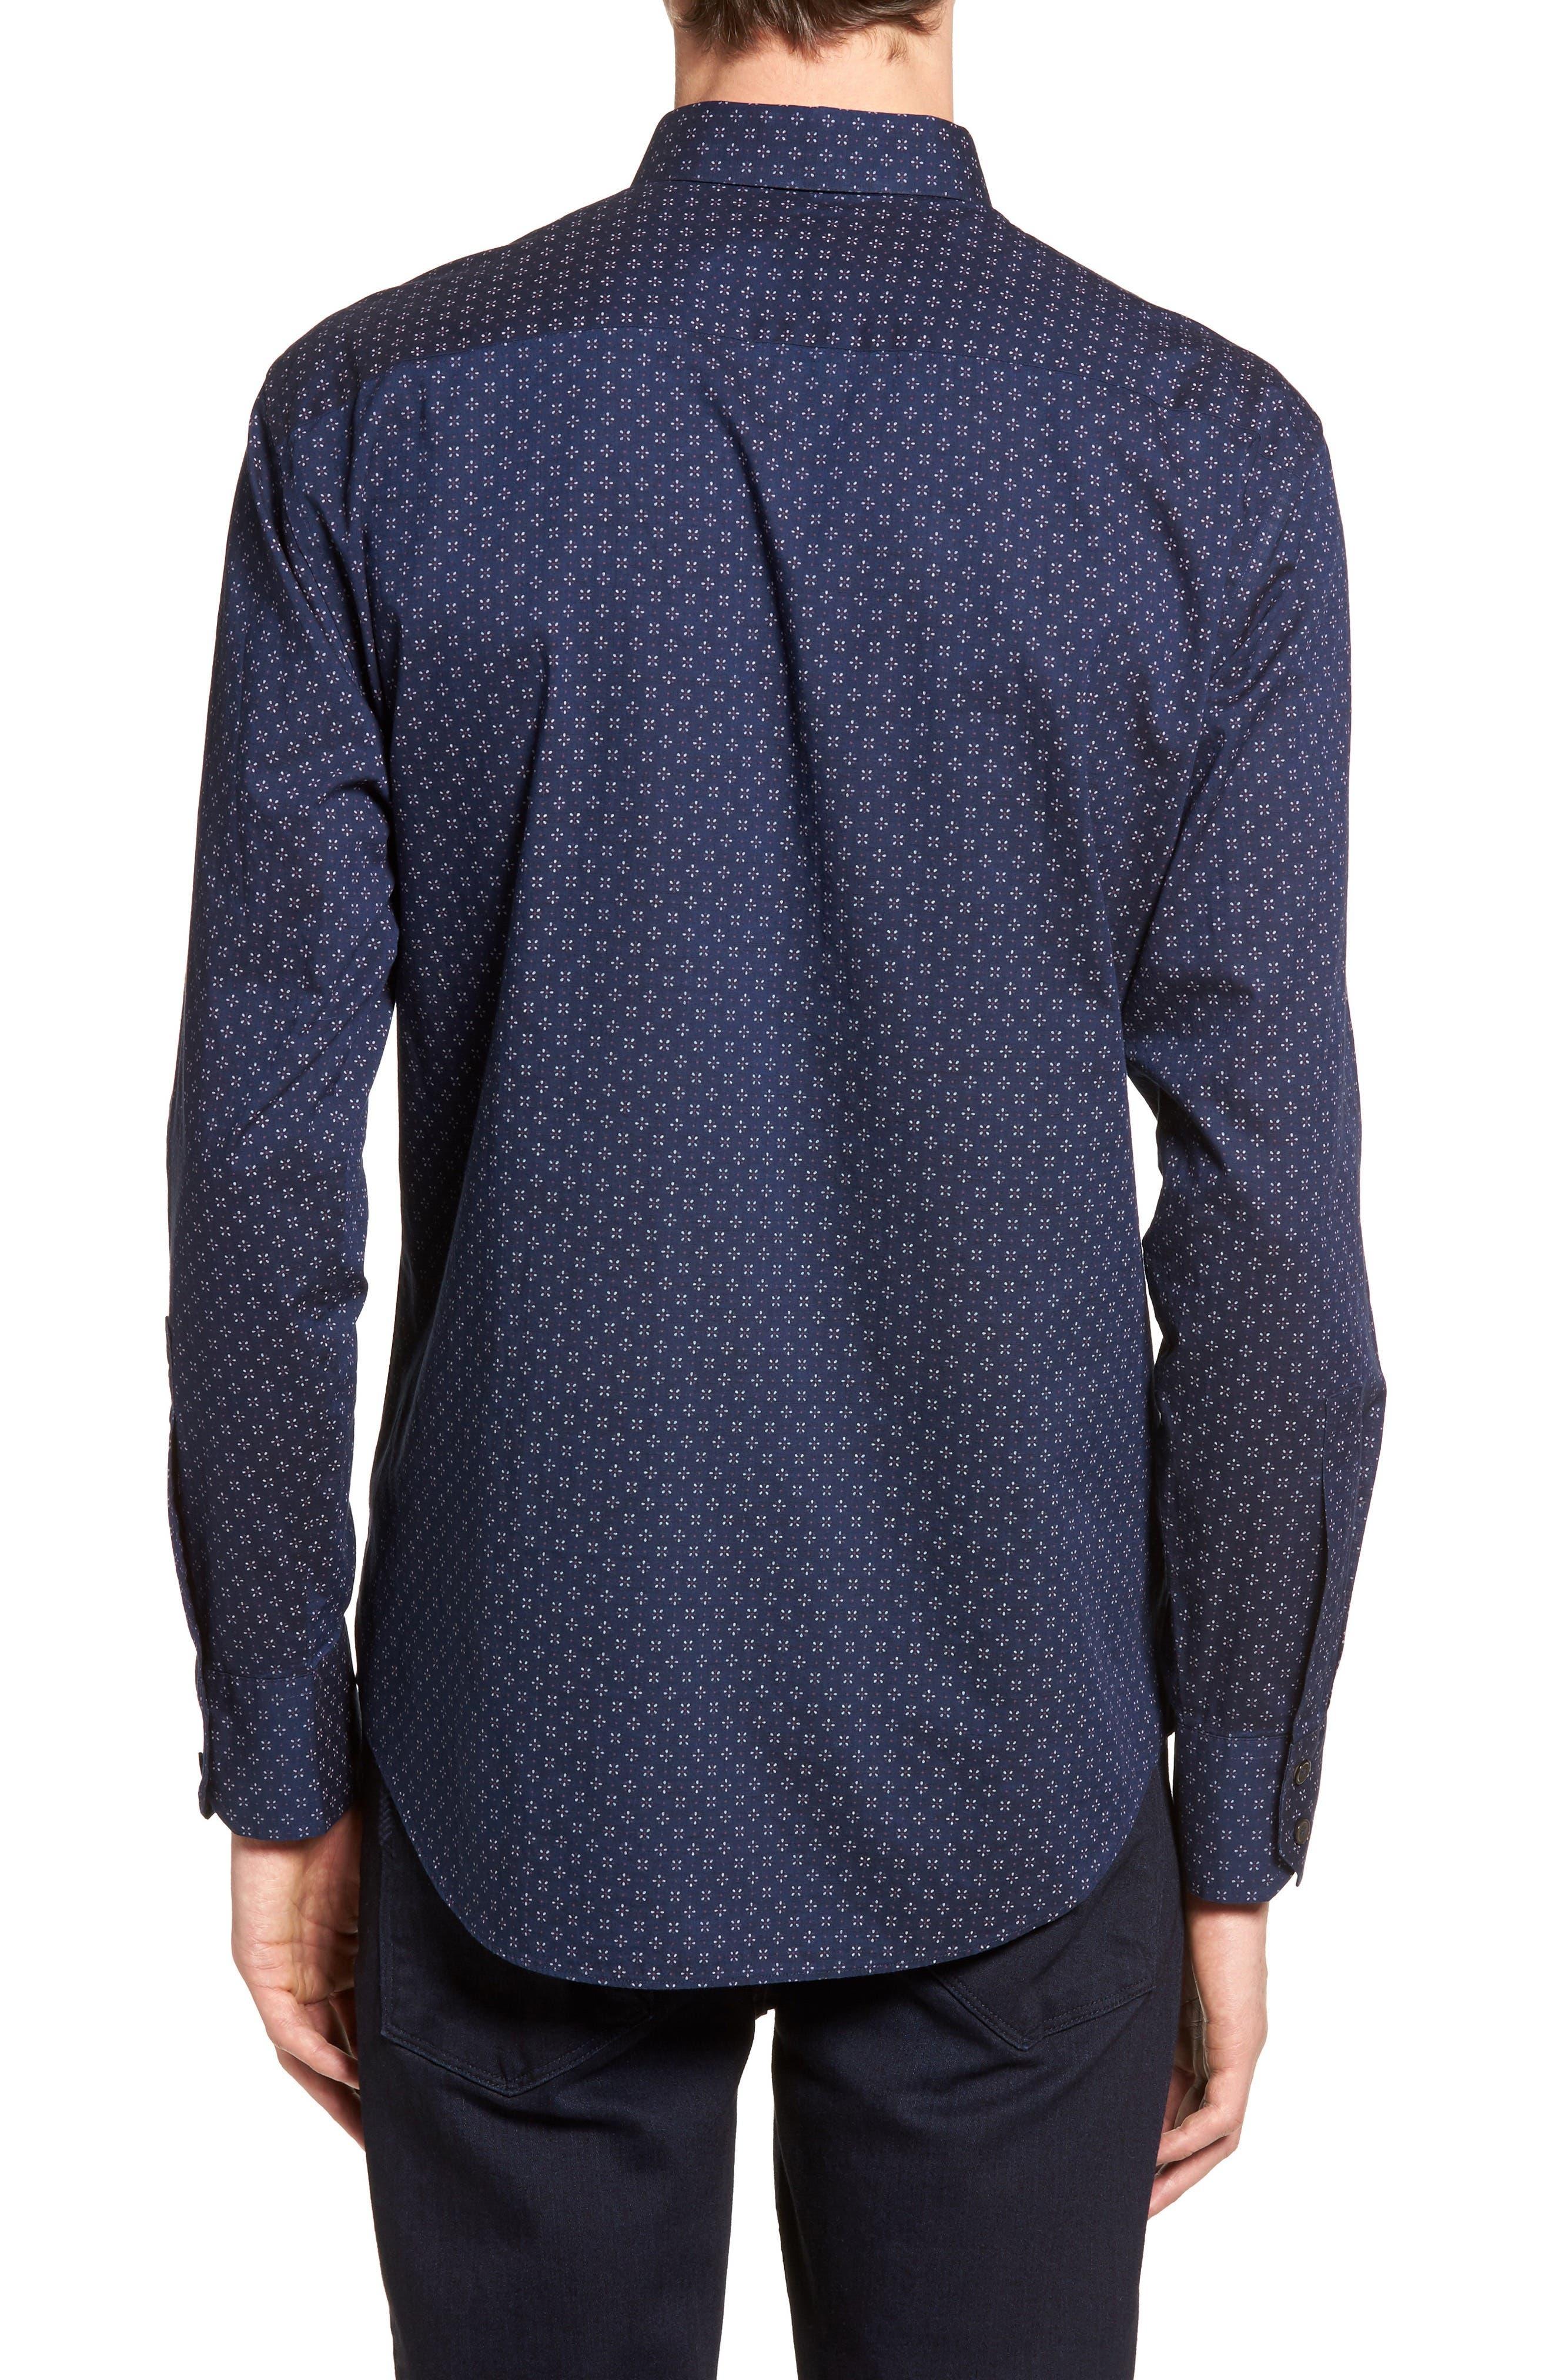 Alternate Image 2  - Zachary Prell Kinnear Slim Fit Print Shirt